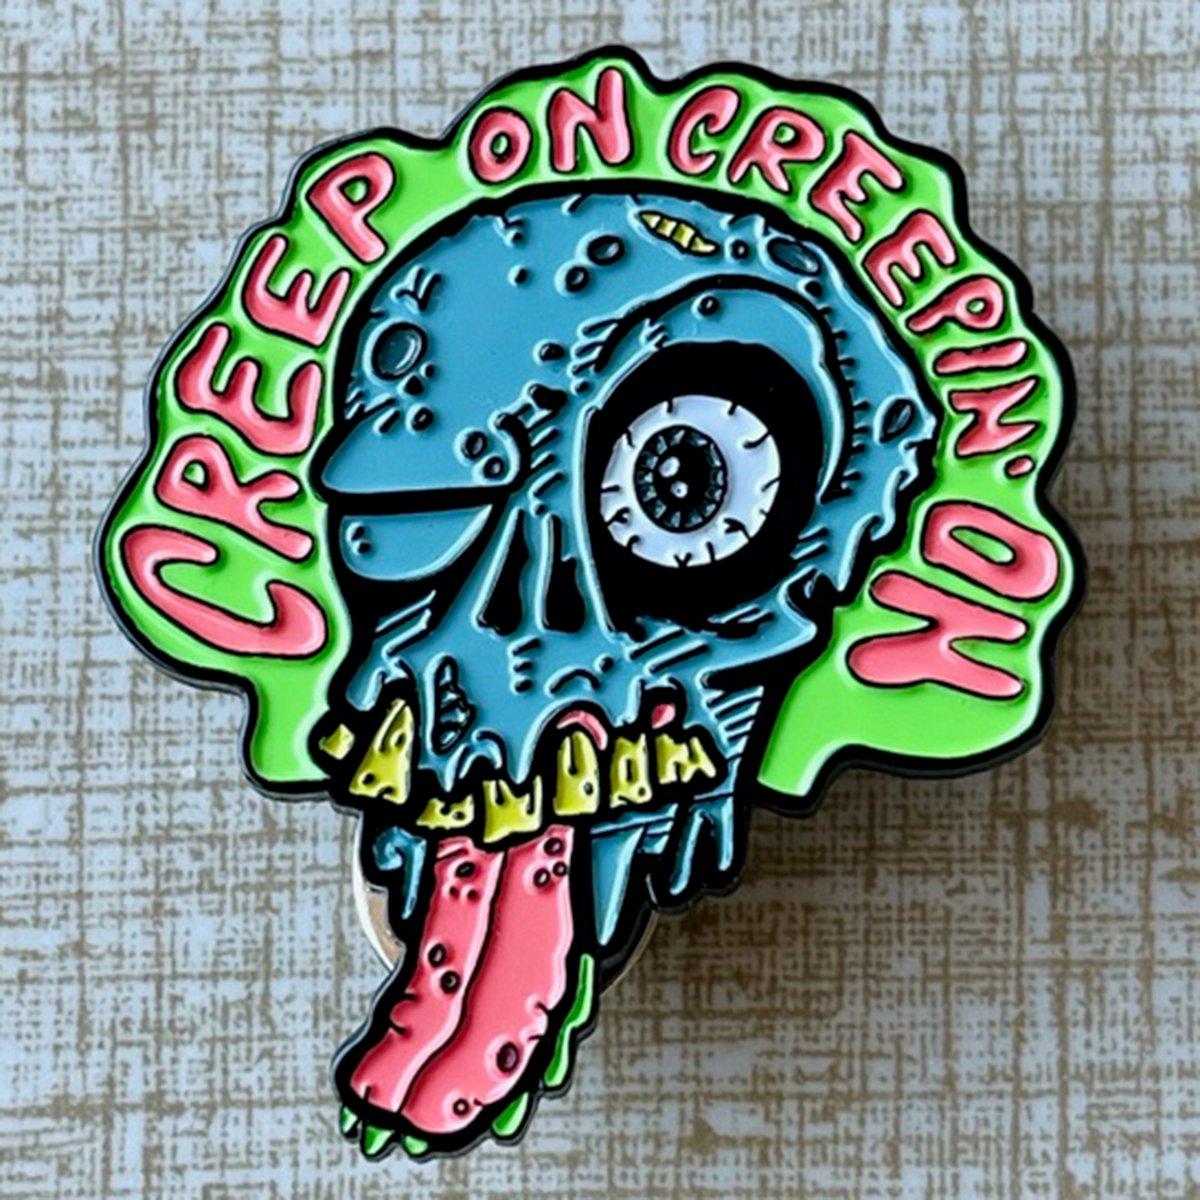 "CREEP ON CREEPIN' ON Rotting Zombie 1.75"" Soft Enamel Pin"